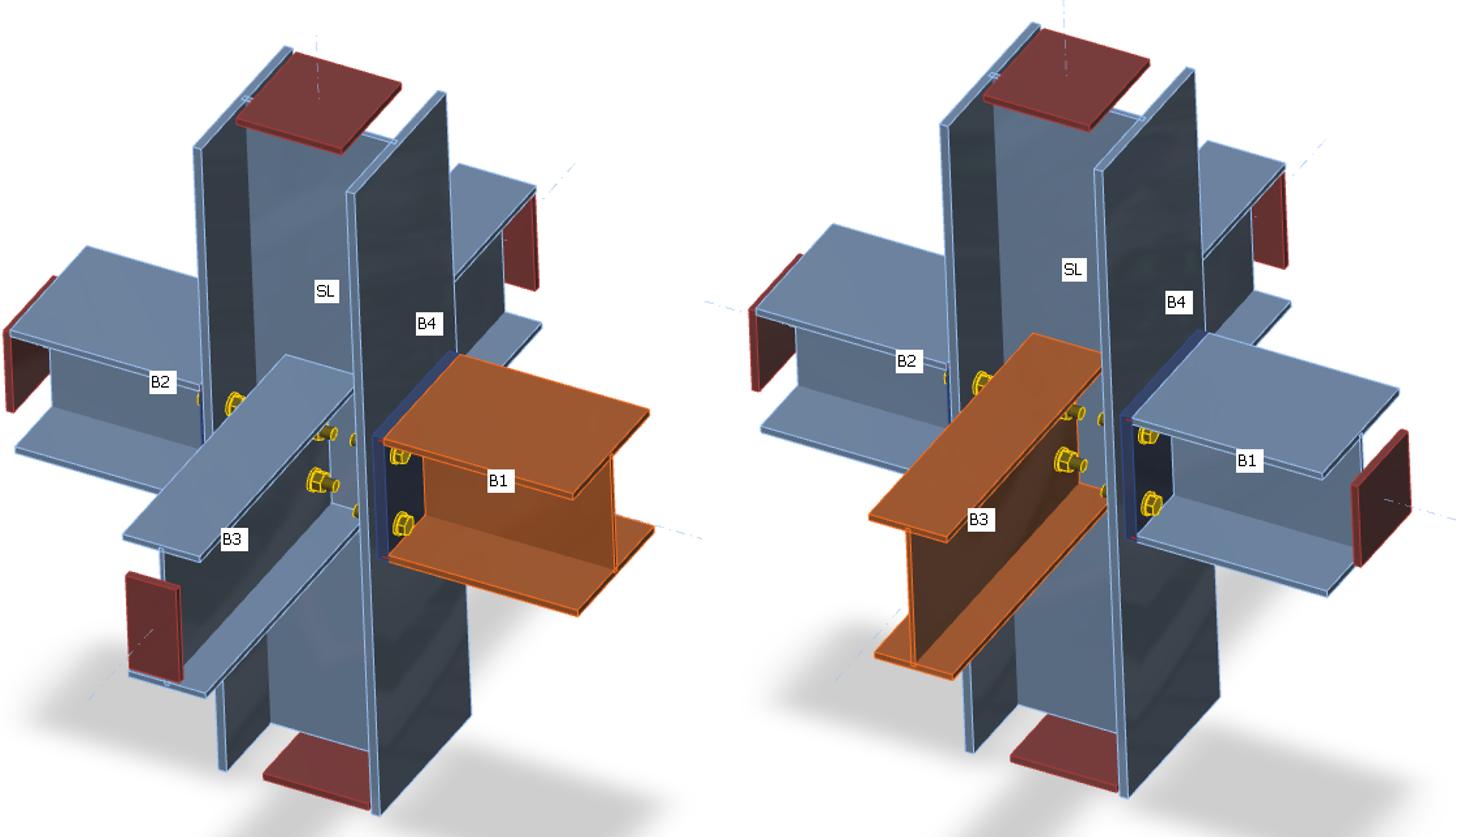 Stijfheidsberekening van de verbinding met berekende staaf in plaats van dragende staaf